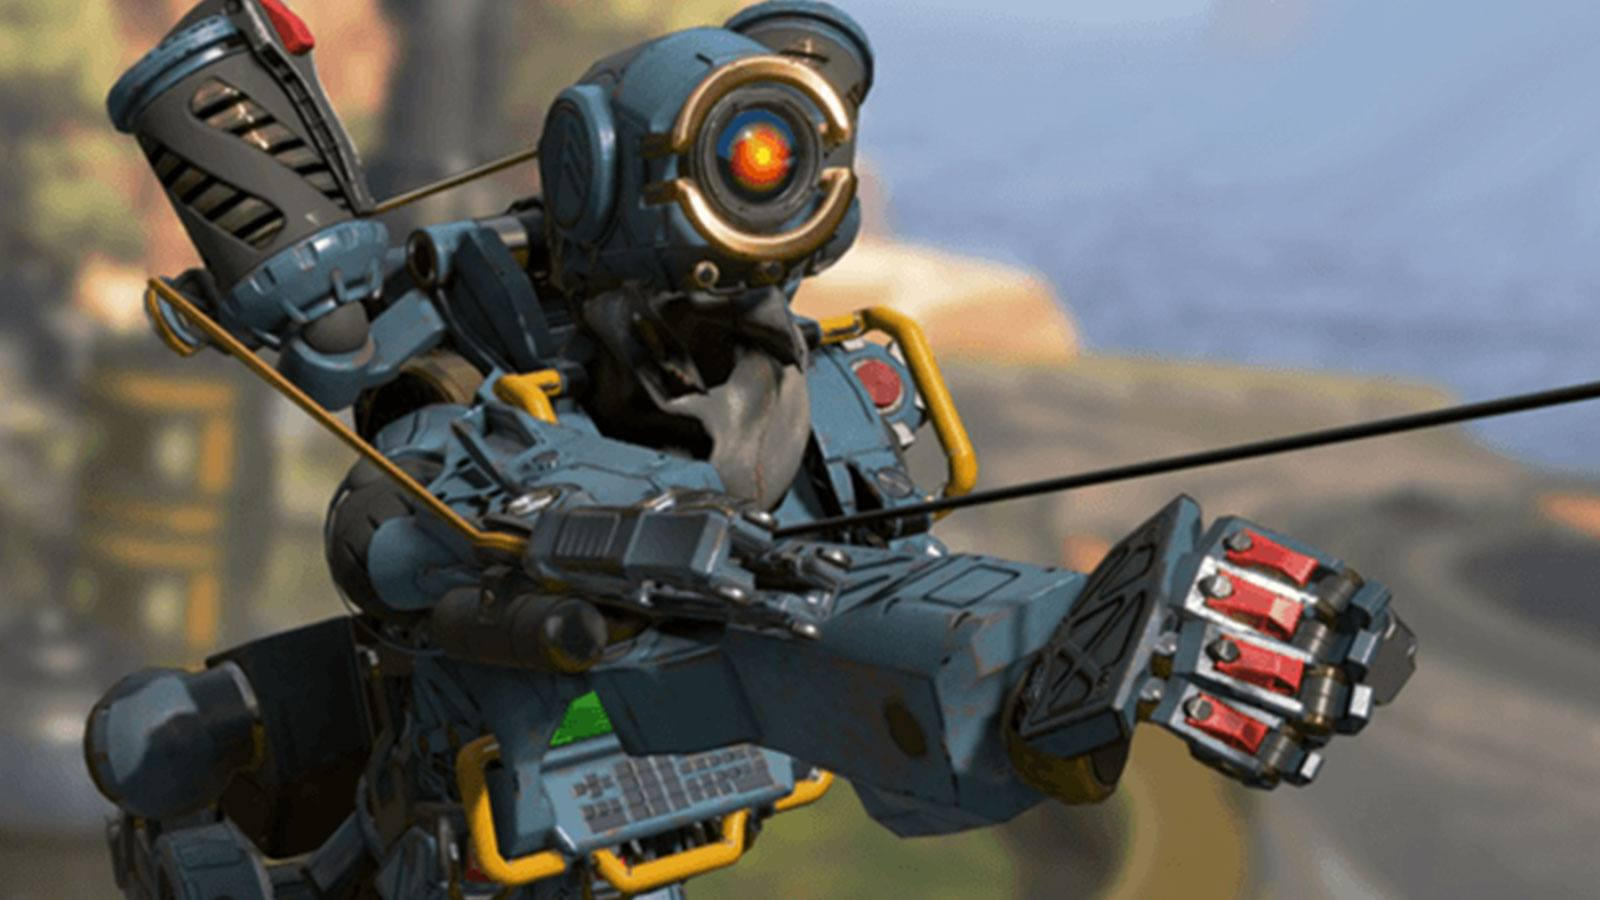 Pathfinder Apex Legends grappin Respawn Entertainment